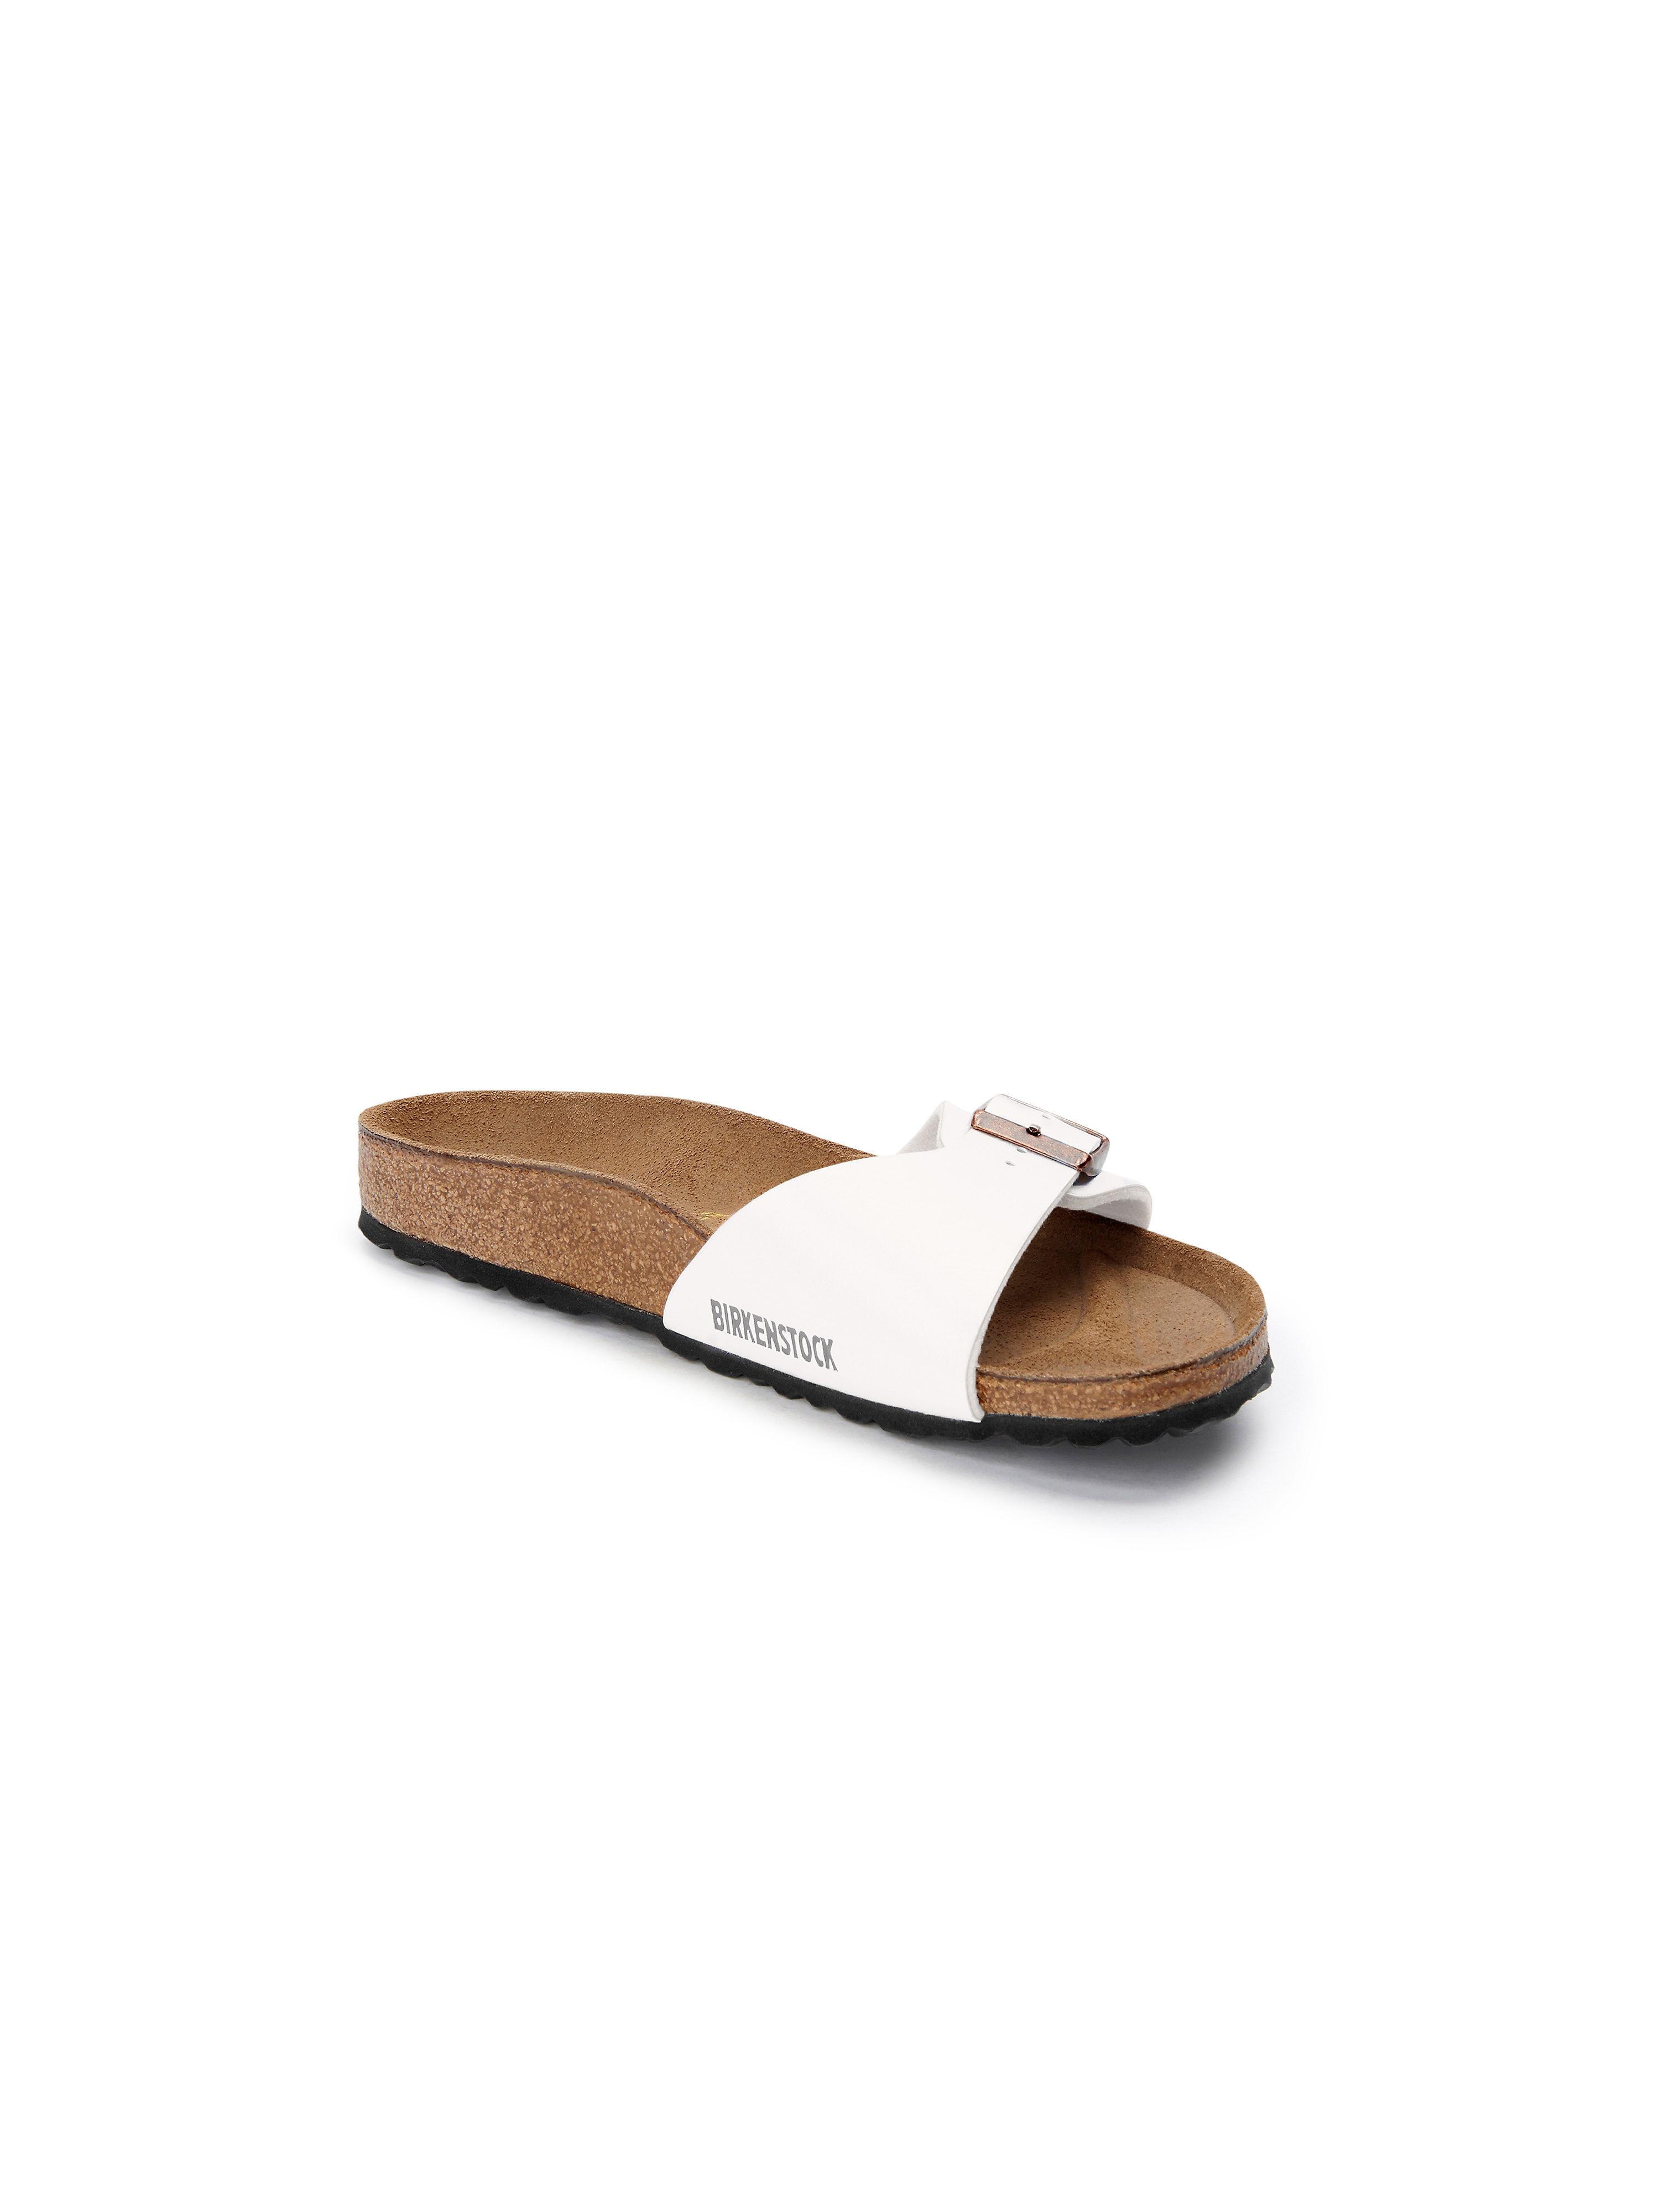 43fb6652f27941 Birkenstock Perlmutt - Pantolette Madrid - Perlmutt Birkenstock Gute  Qualität beliebte Schuhe 0bc23b